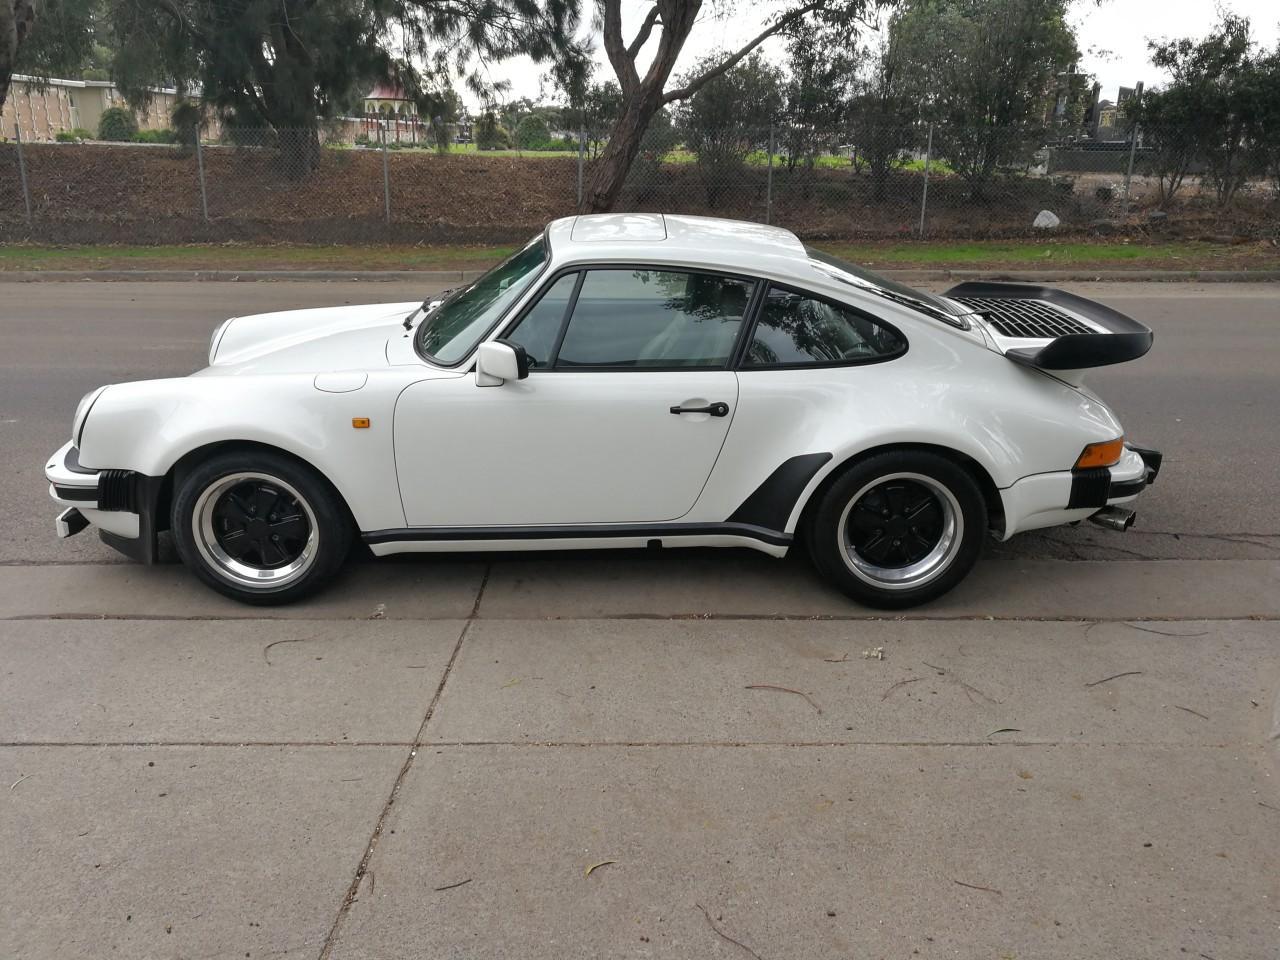 Porsche 930 Turbo #1